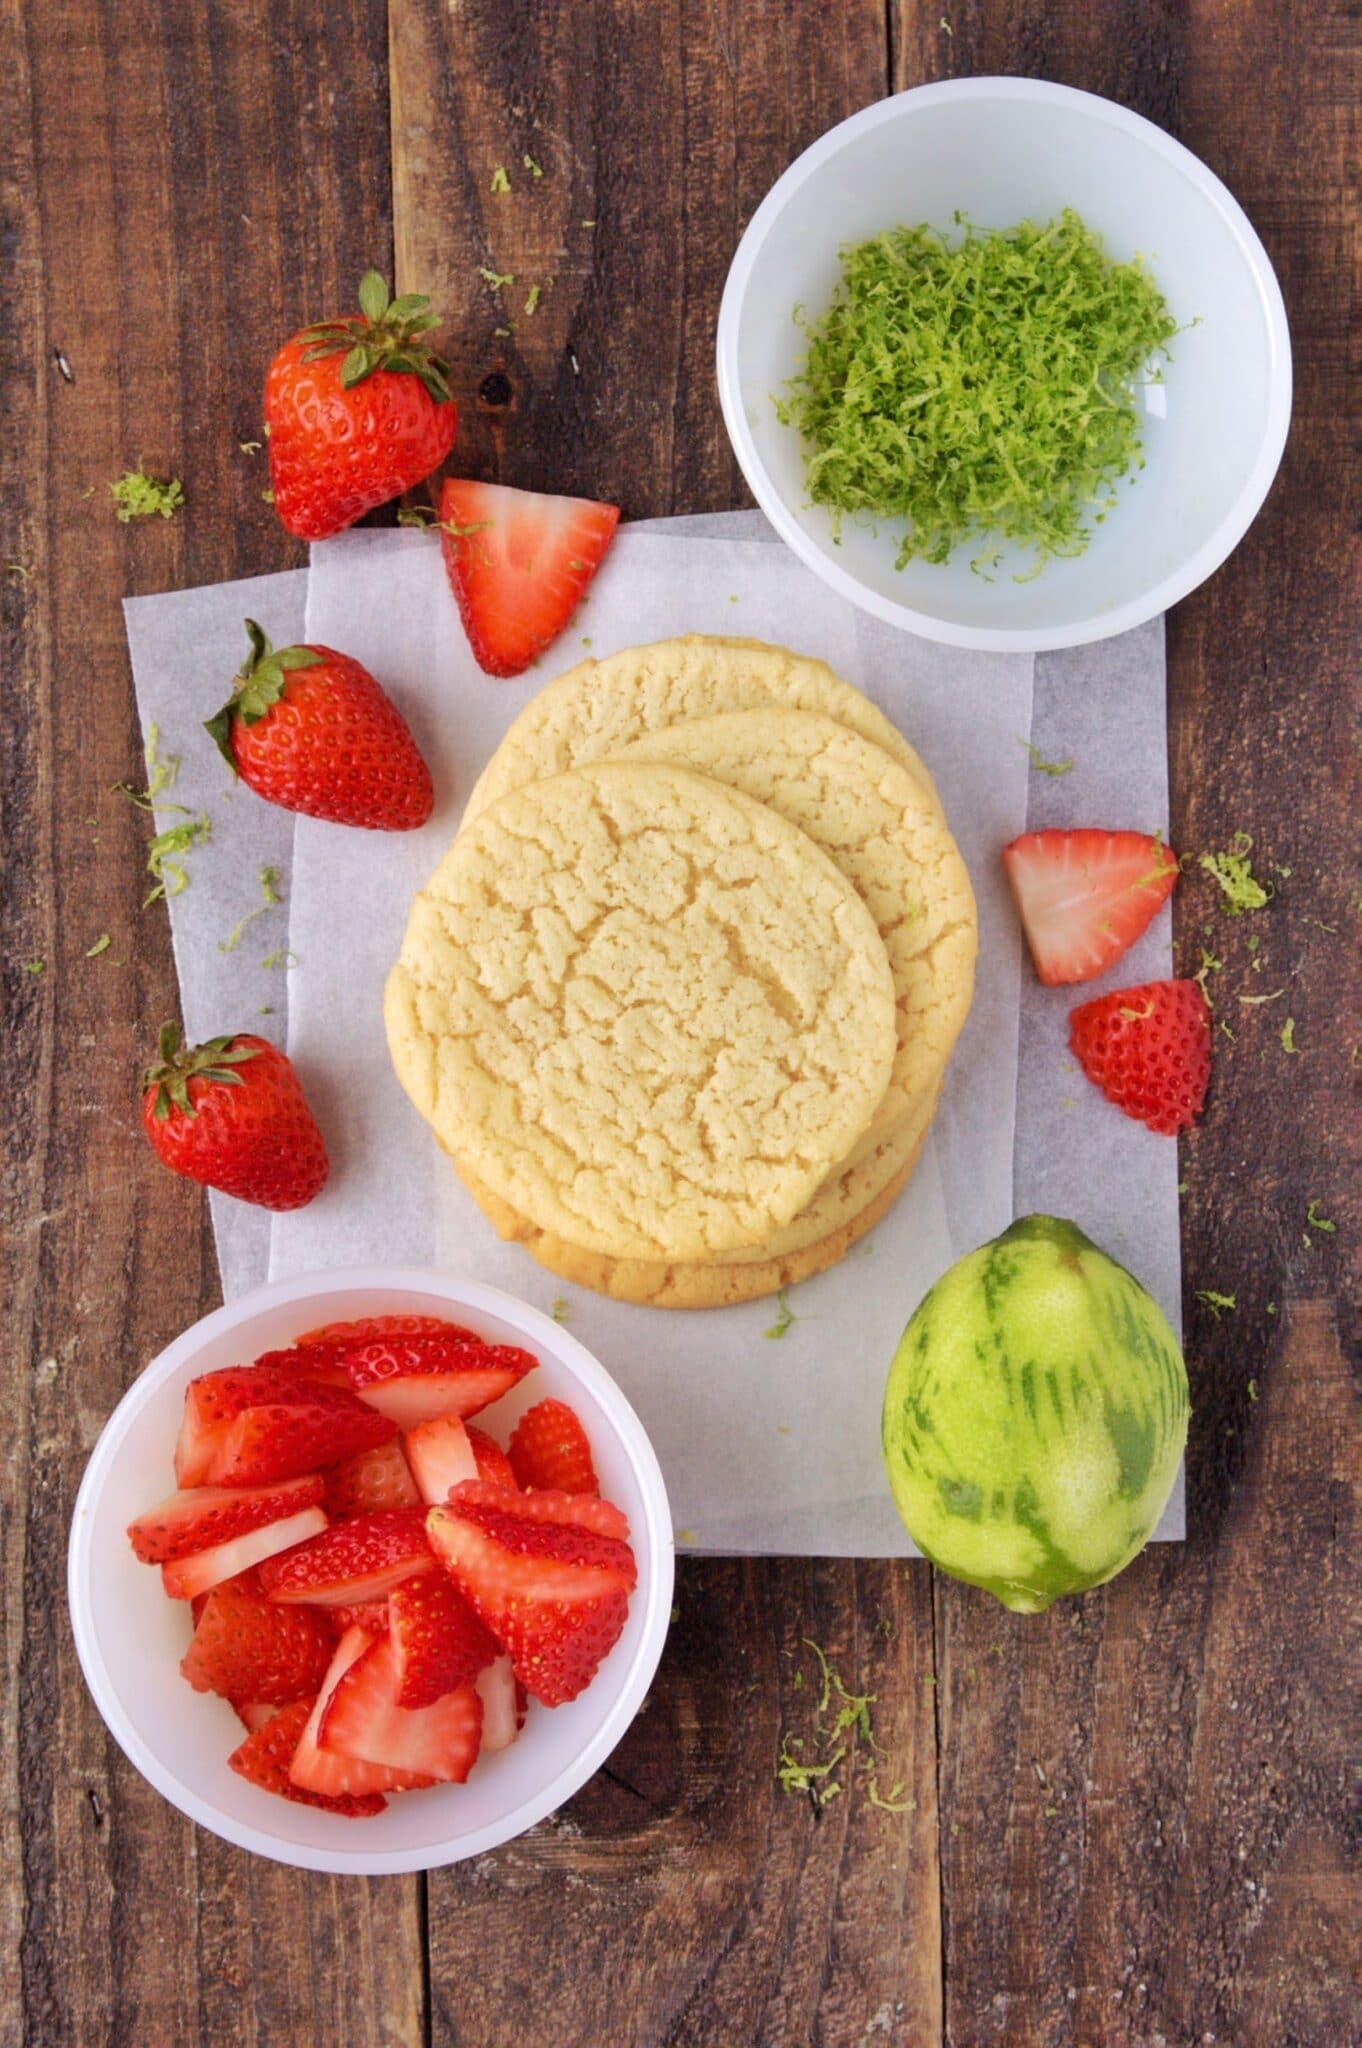 ingredients needed to make strawberry sugar cookies